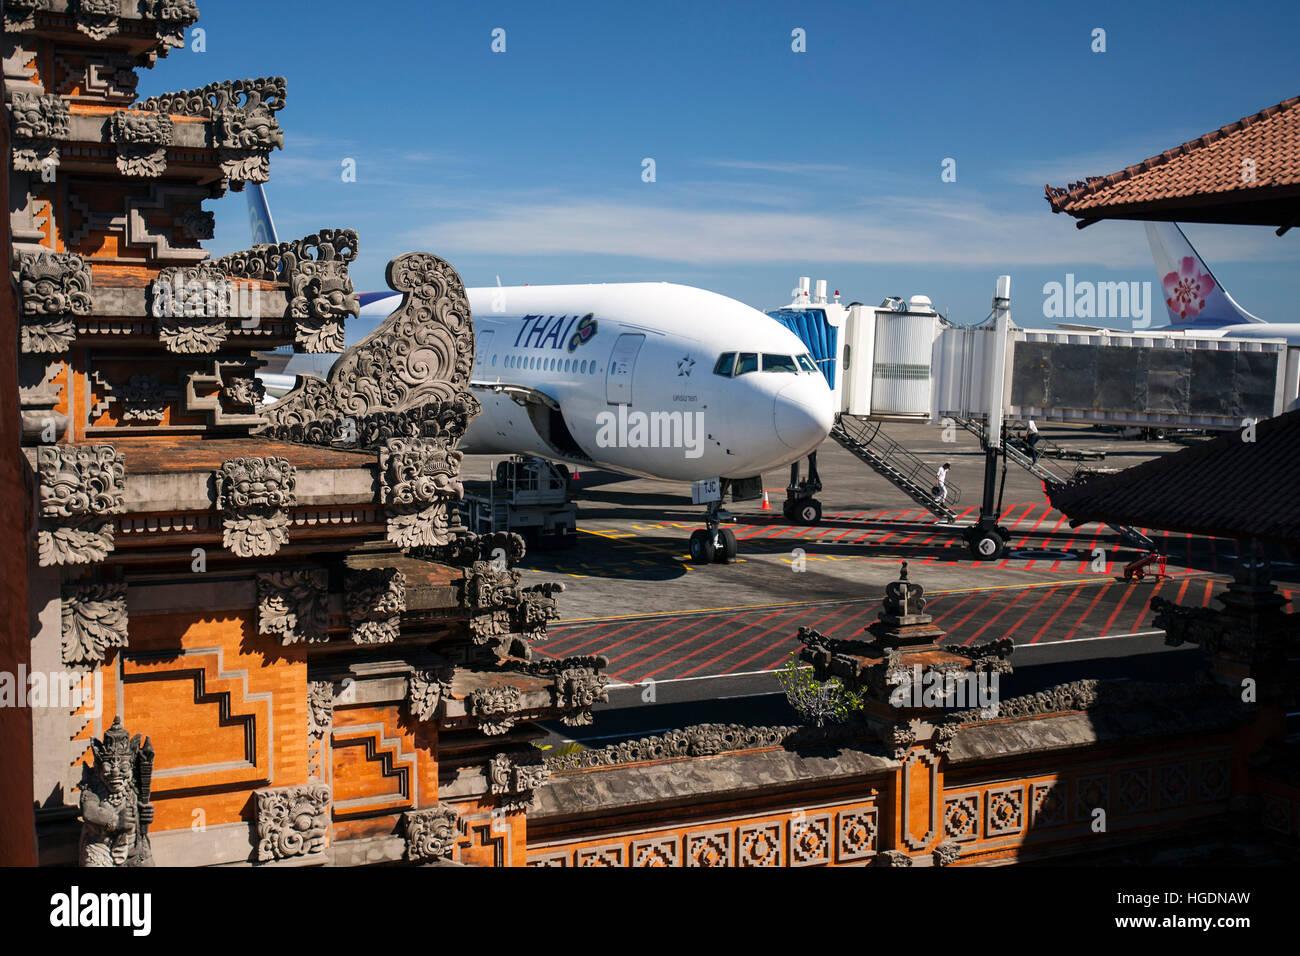 Aeroporto Bali : Thai airways boeing denpasar aeroporto di ngurah rai bali